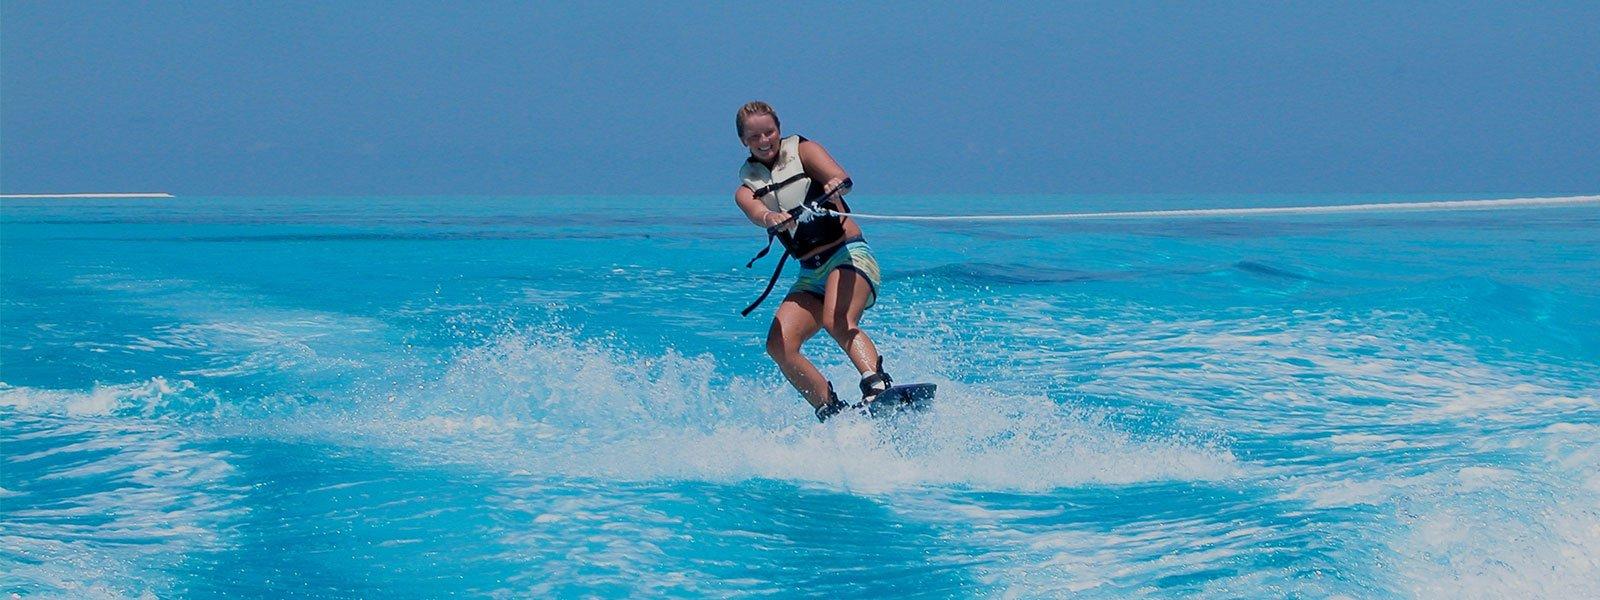 kuredu-sports-wakeboarding_1600x600